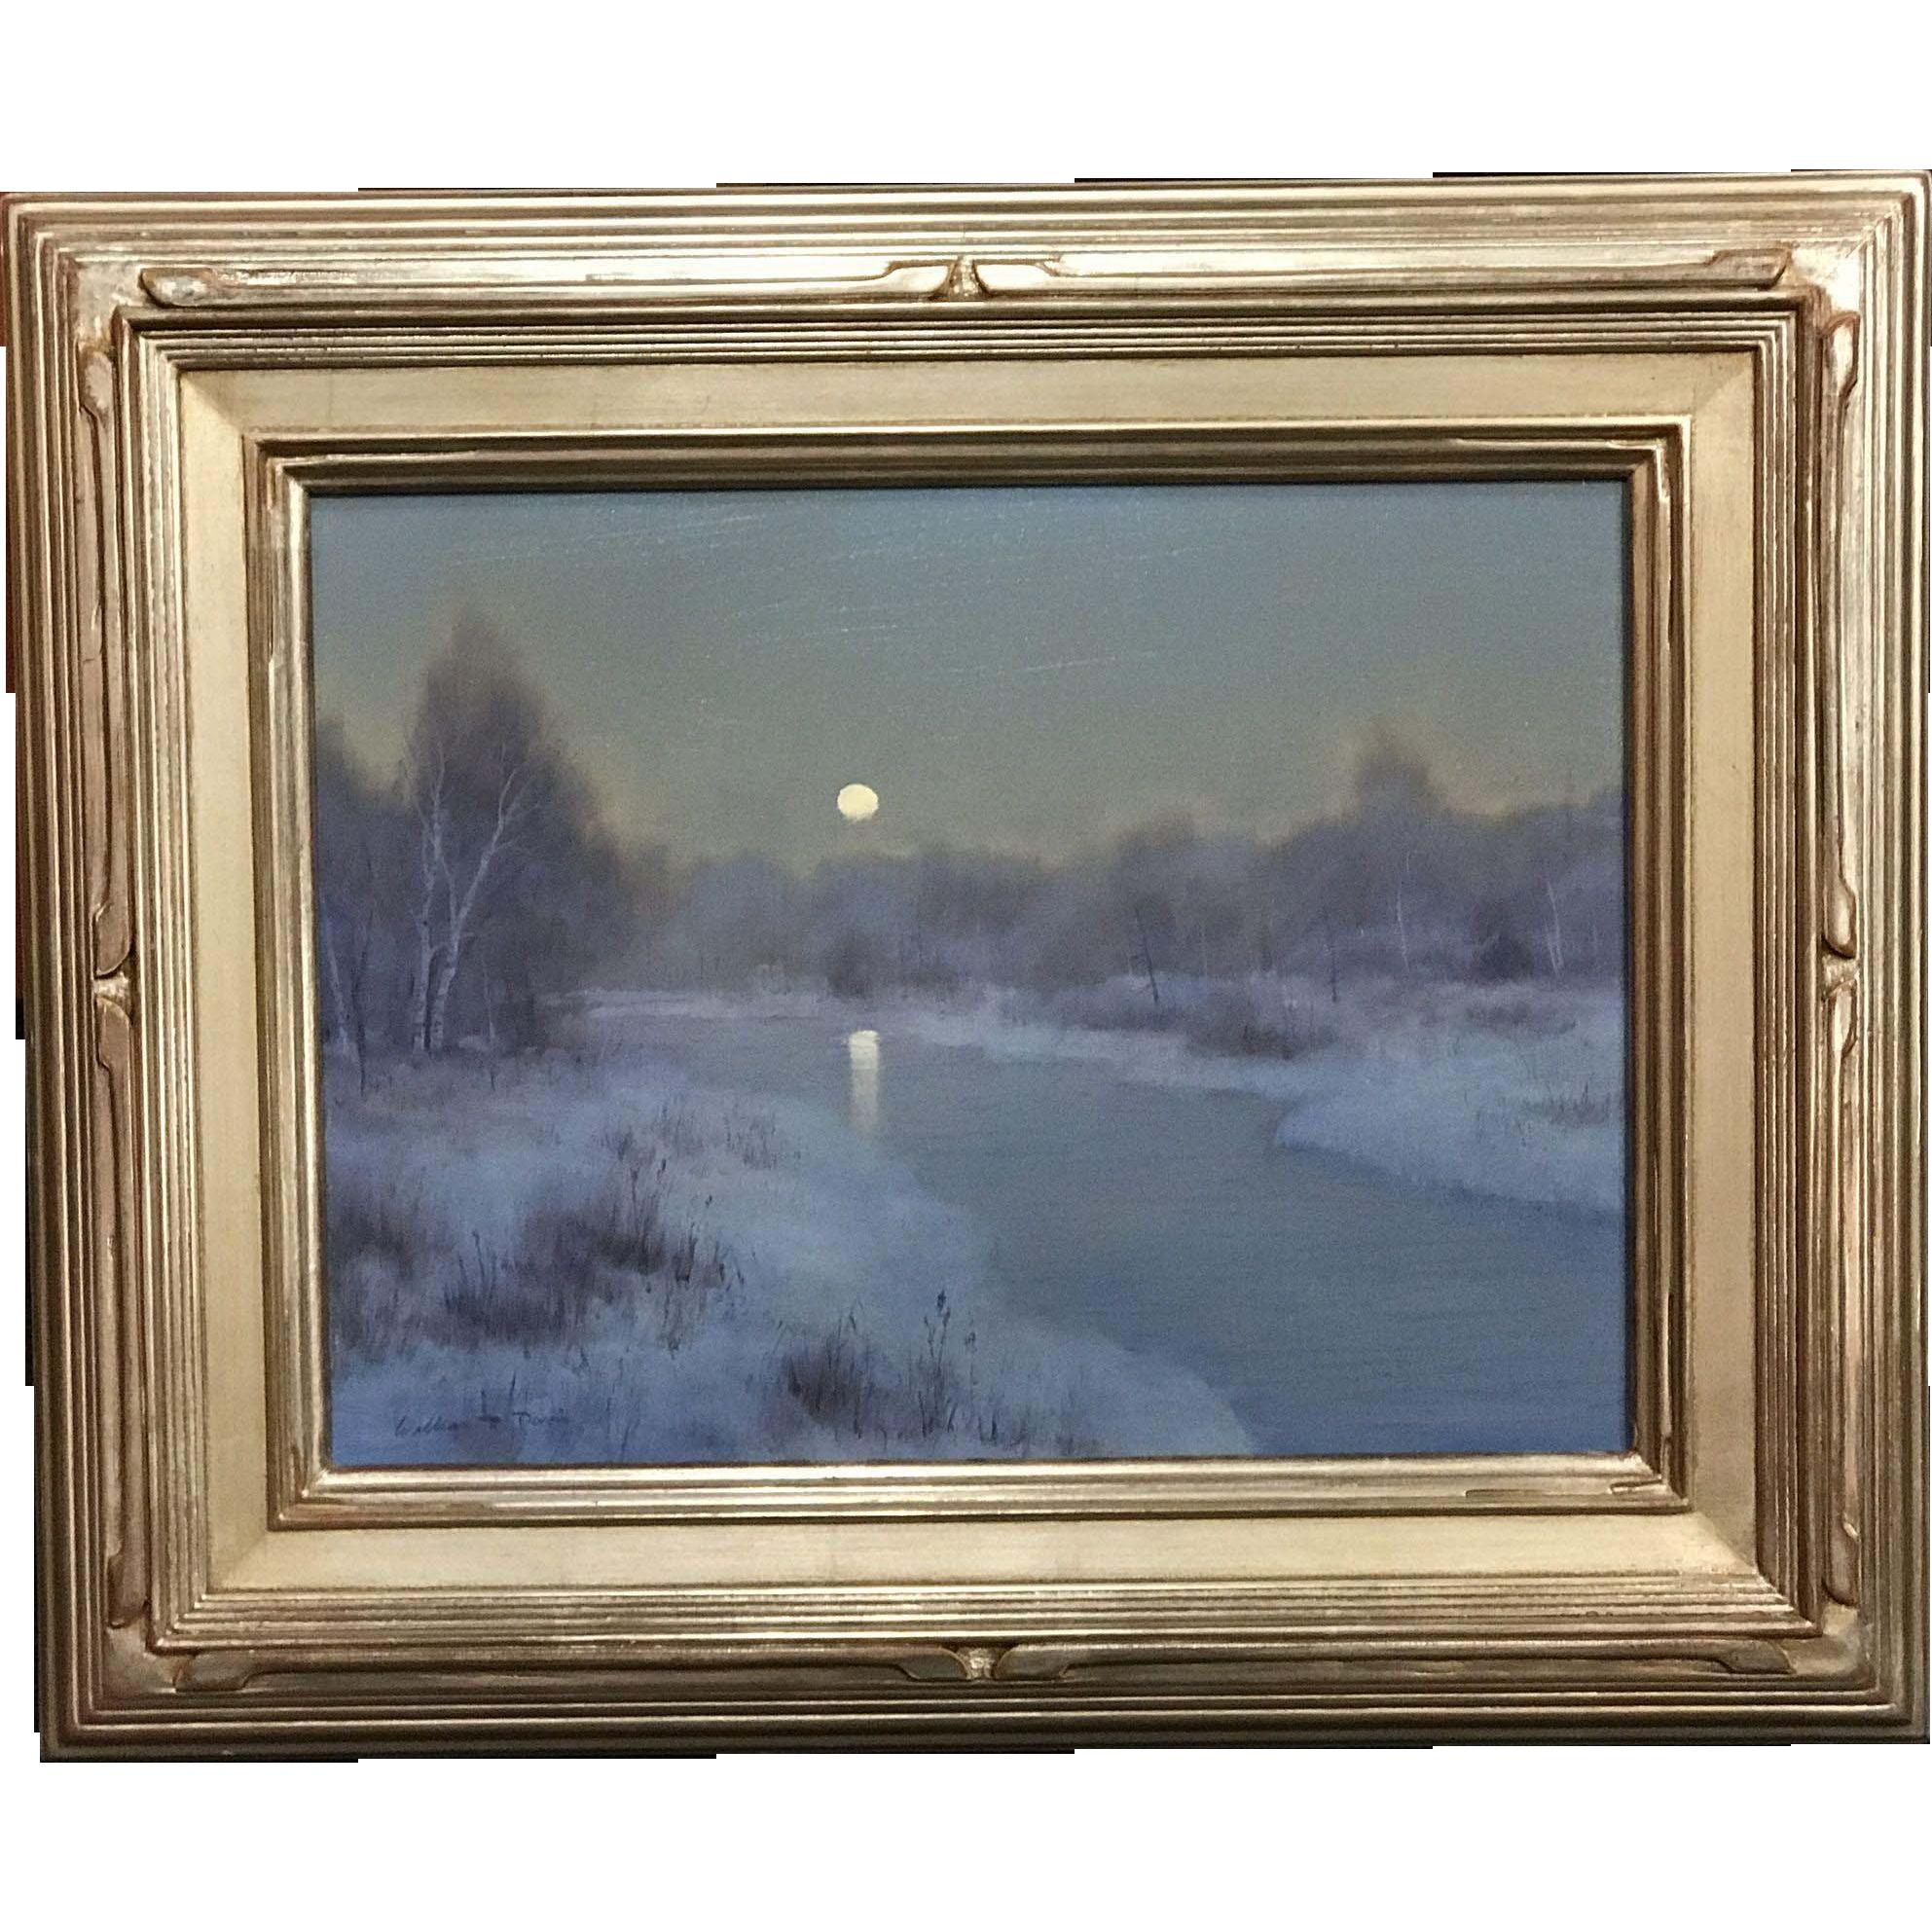 William R. Davis Tonalist Winter Landscape Oil Painting - Frosty Morning